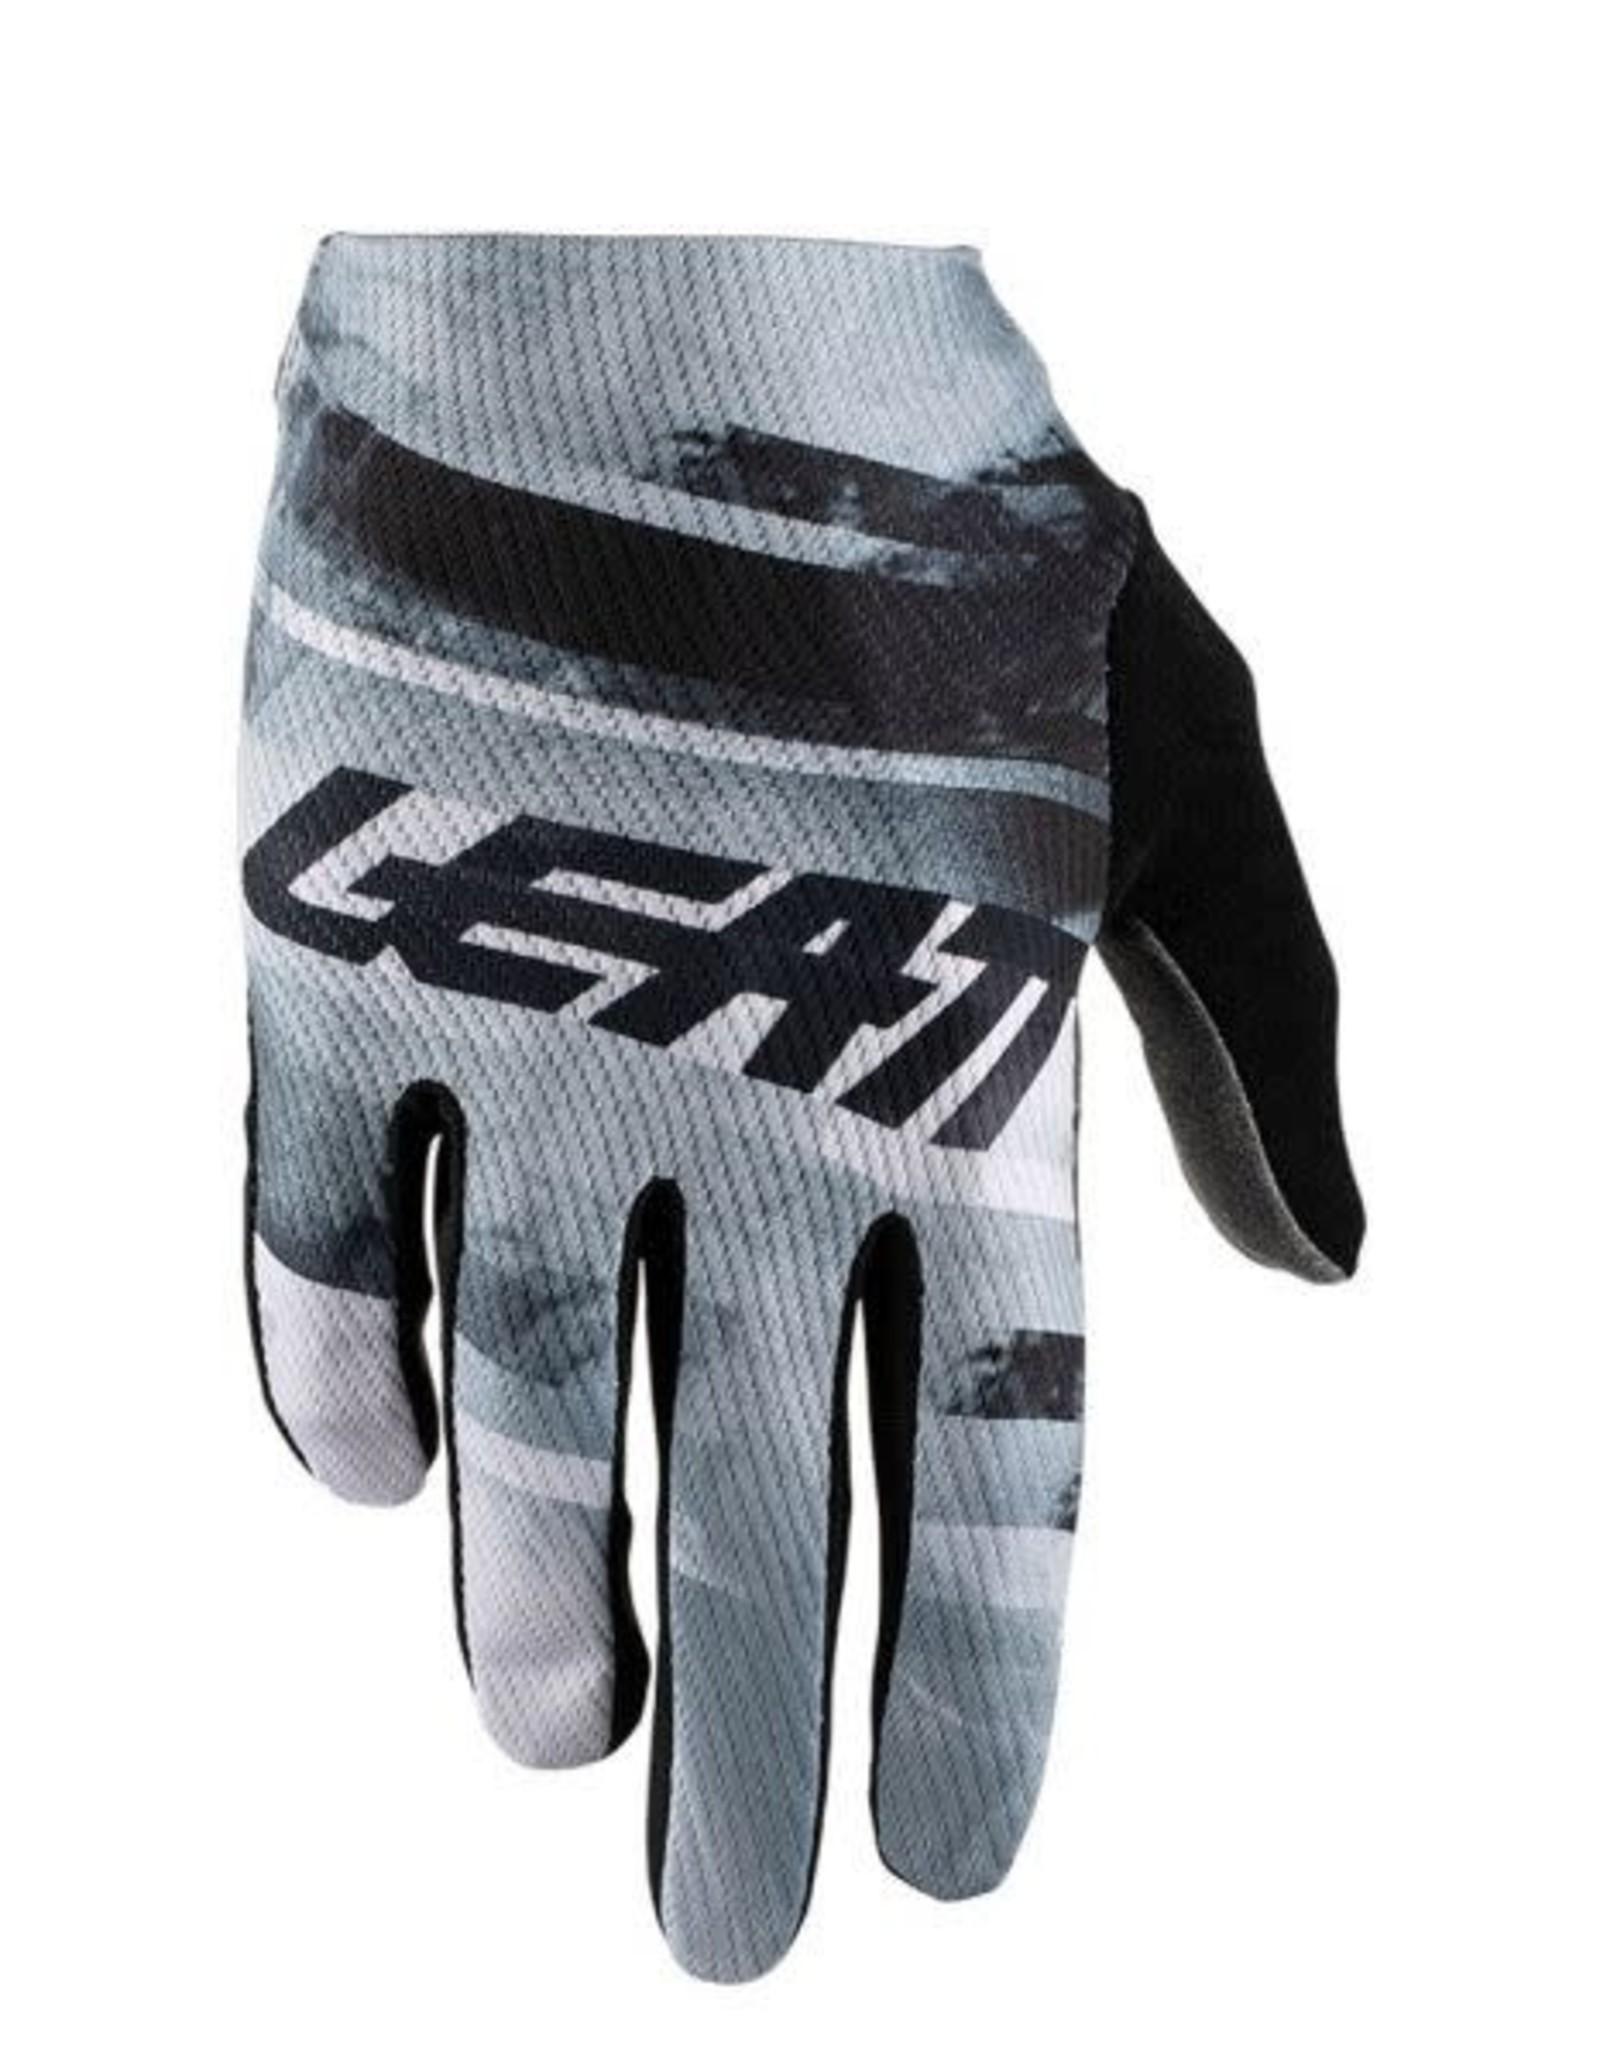 Leatt DBX 1.0 GripR Glove